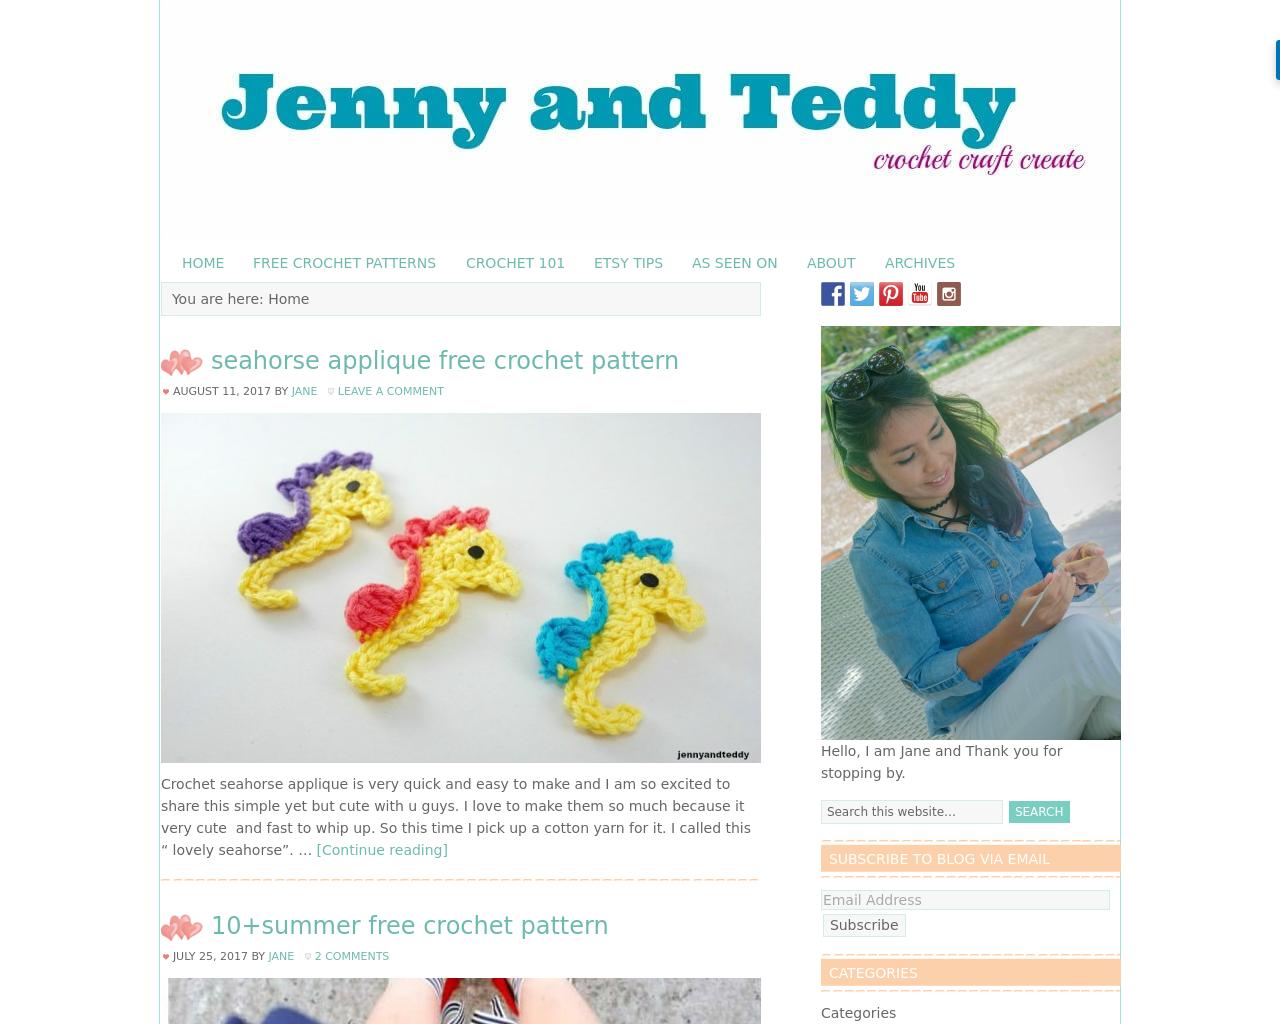 Jennyandteddy-Craft-Blog-Advertising-Reviews-Pricing